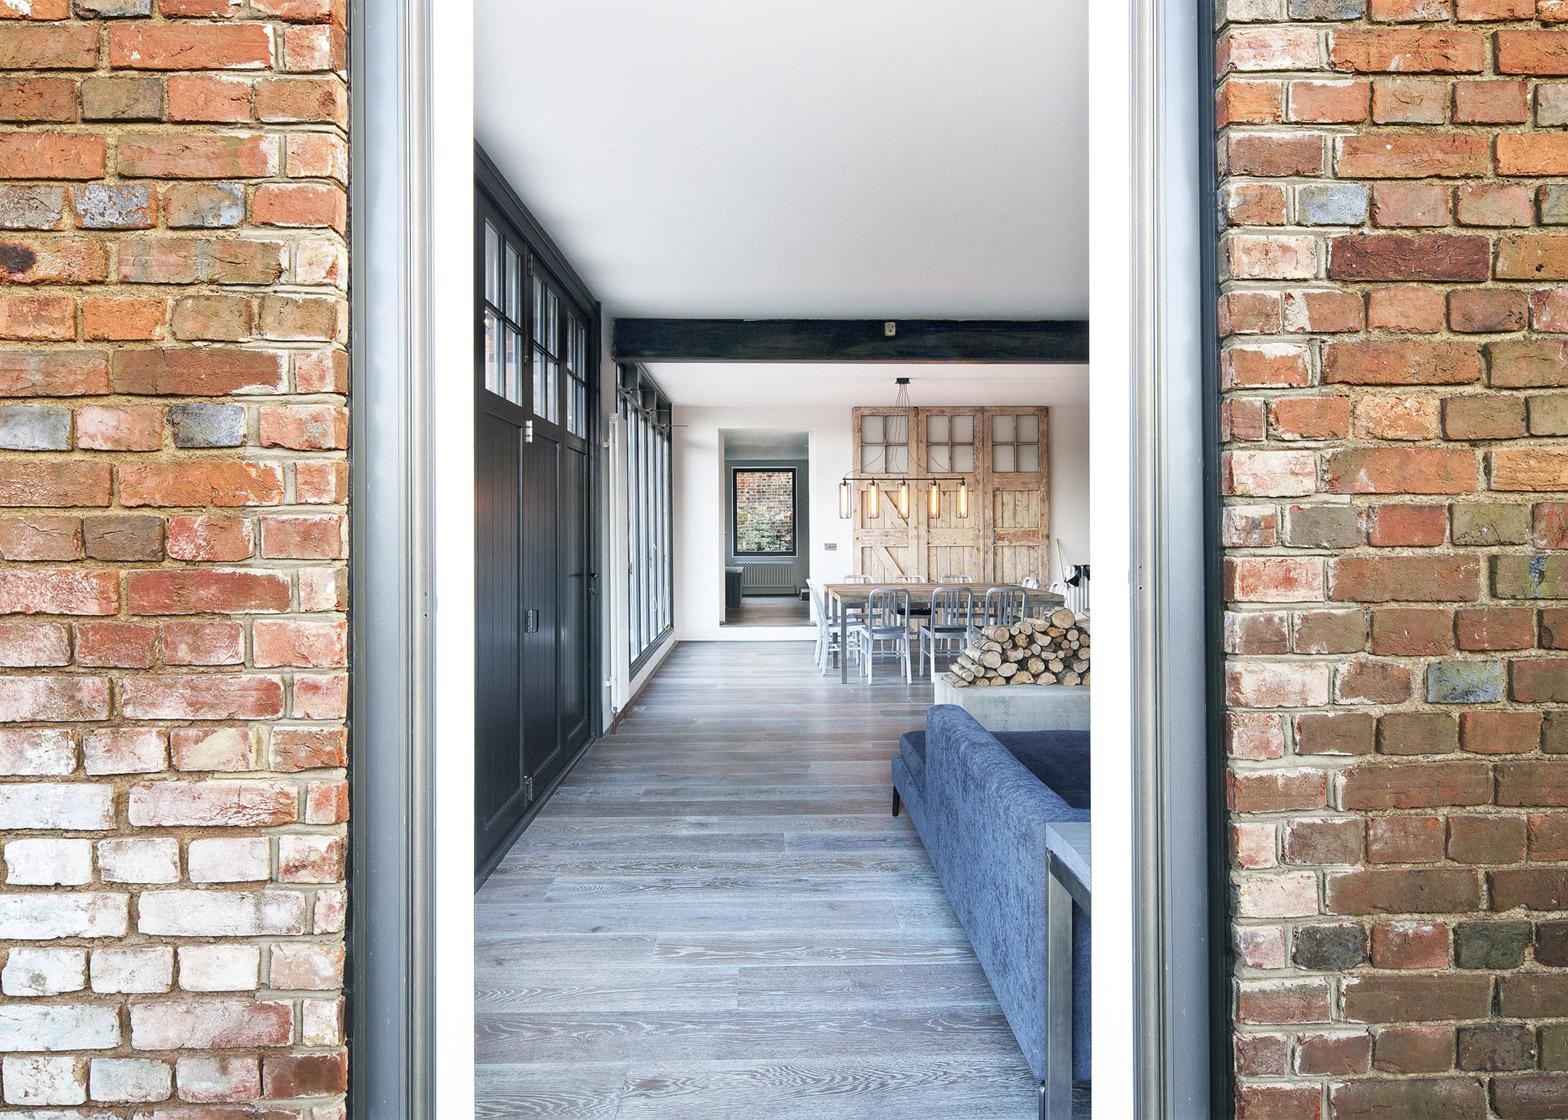 architecture_ambulance_house__design_studia_interiors_osnovadesign_osnova_poltava_09